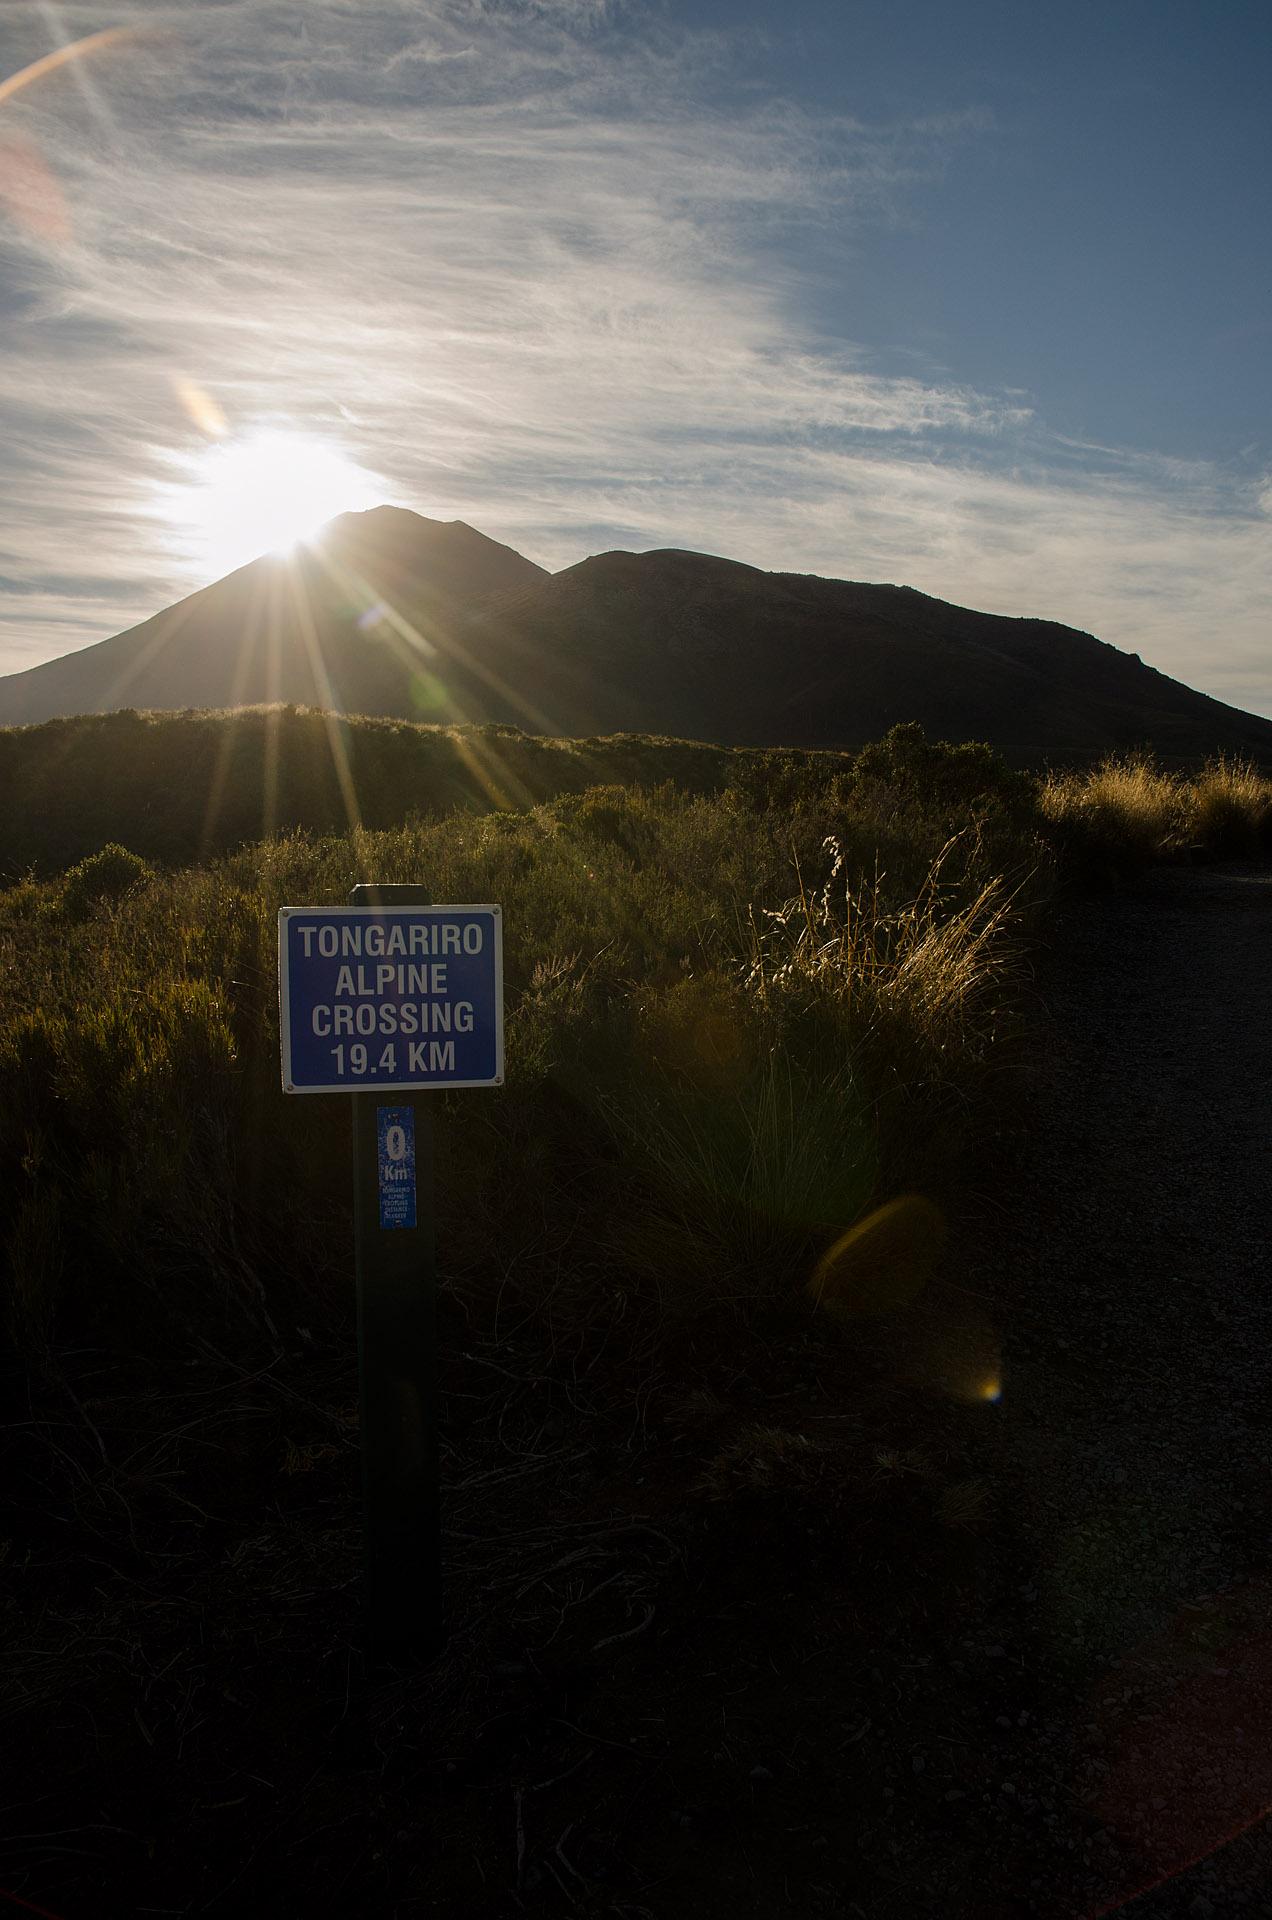 Tongariro Alpine Crossing Trailhead